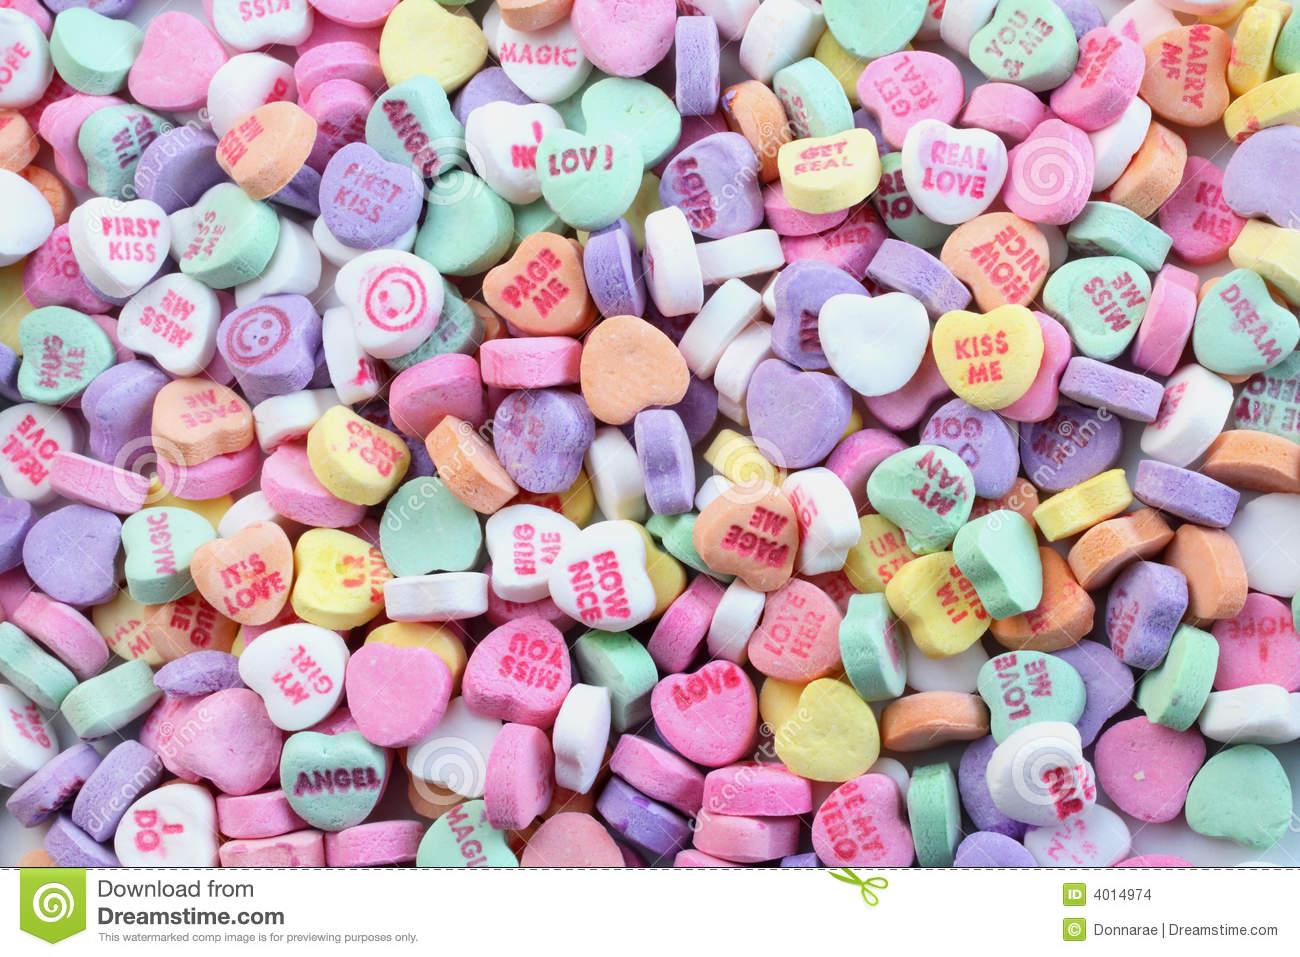 Valentine's Day Candy Hearts Wallpaper - WallpaperSafari